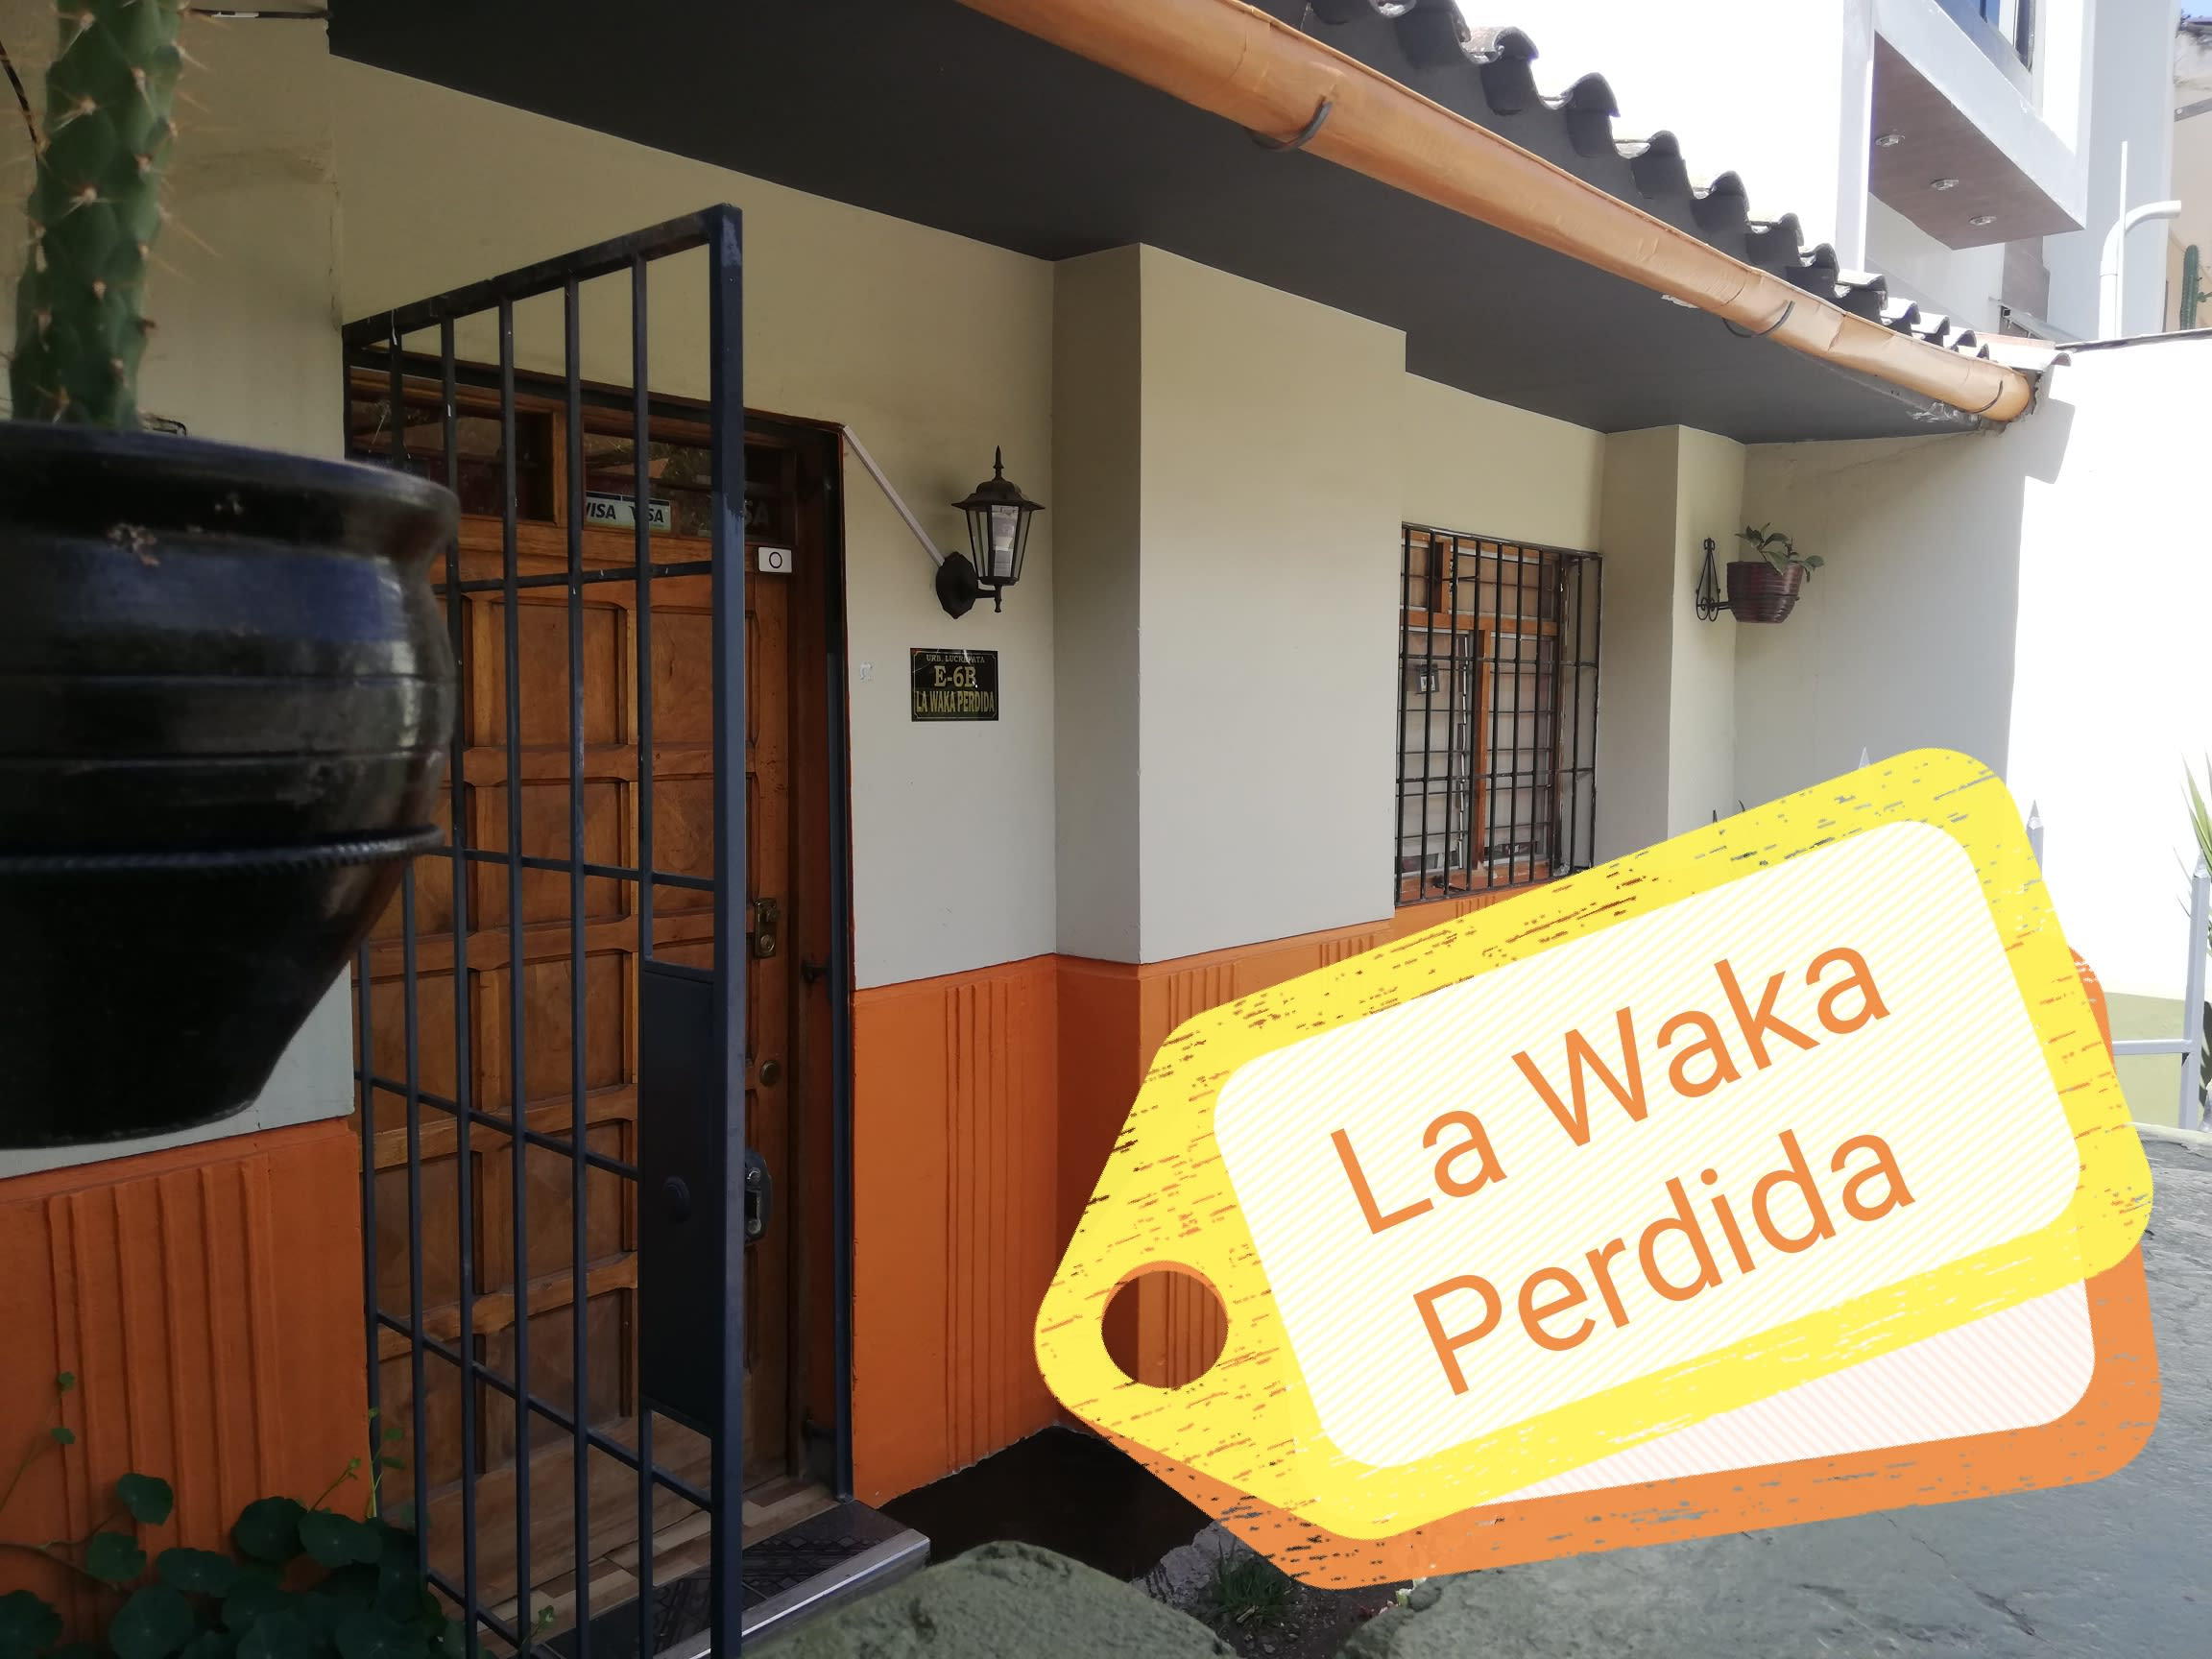 HOSTEL - La Waka Perdida